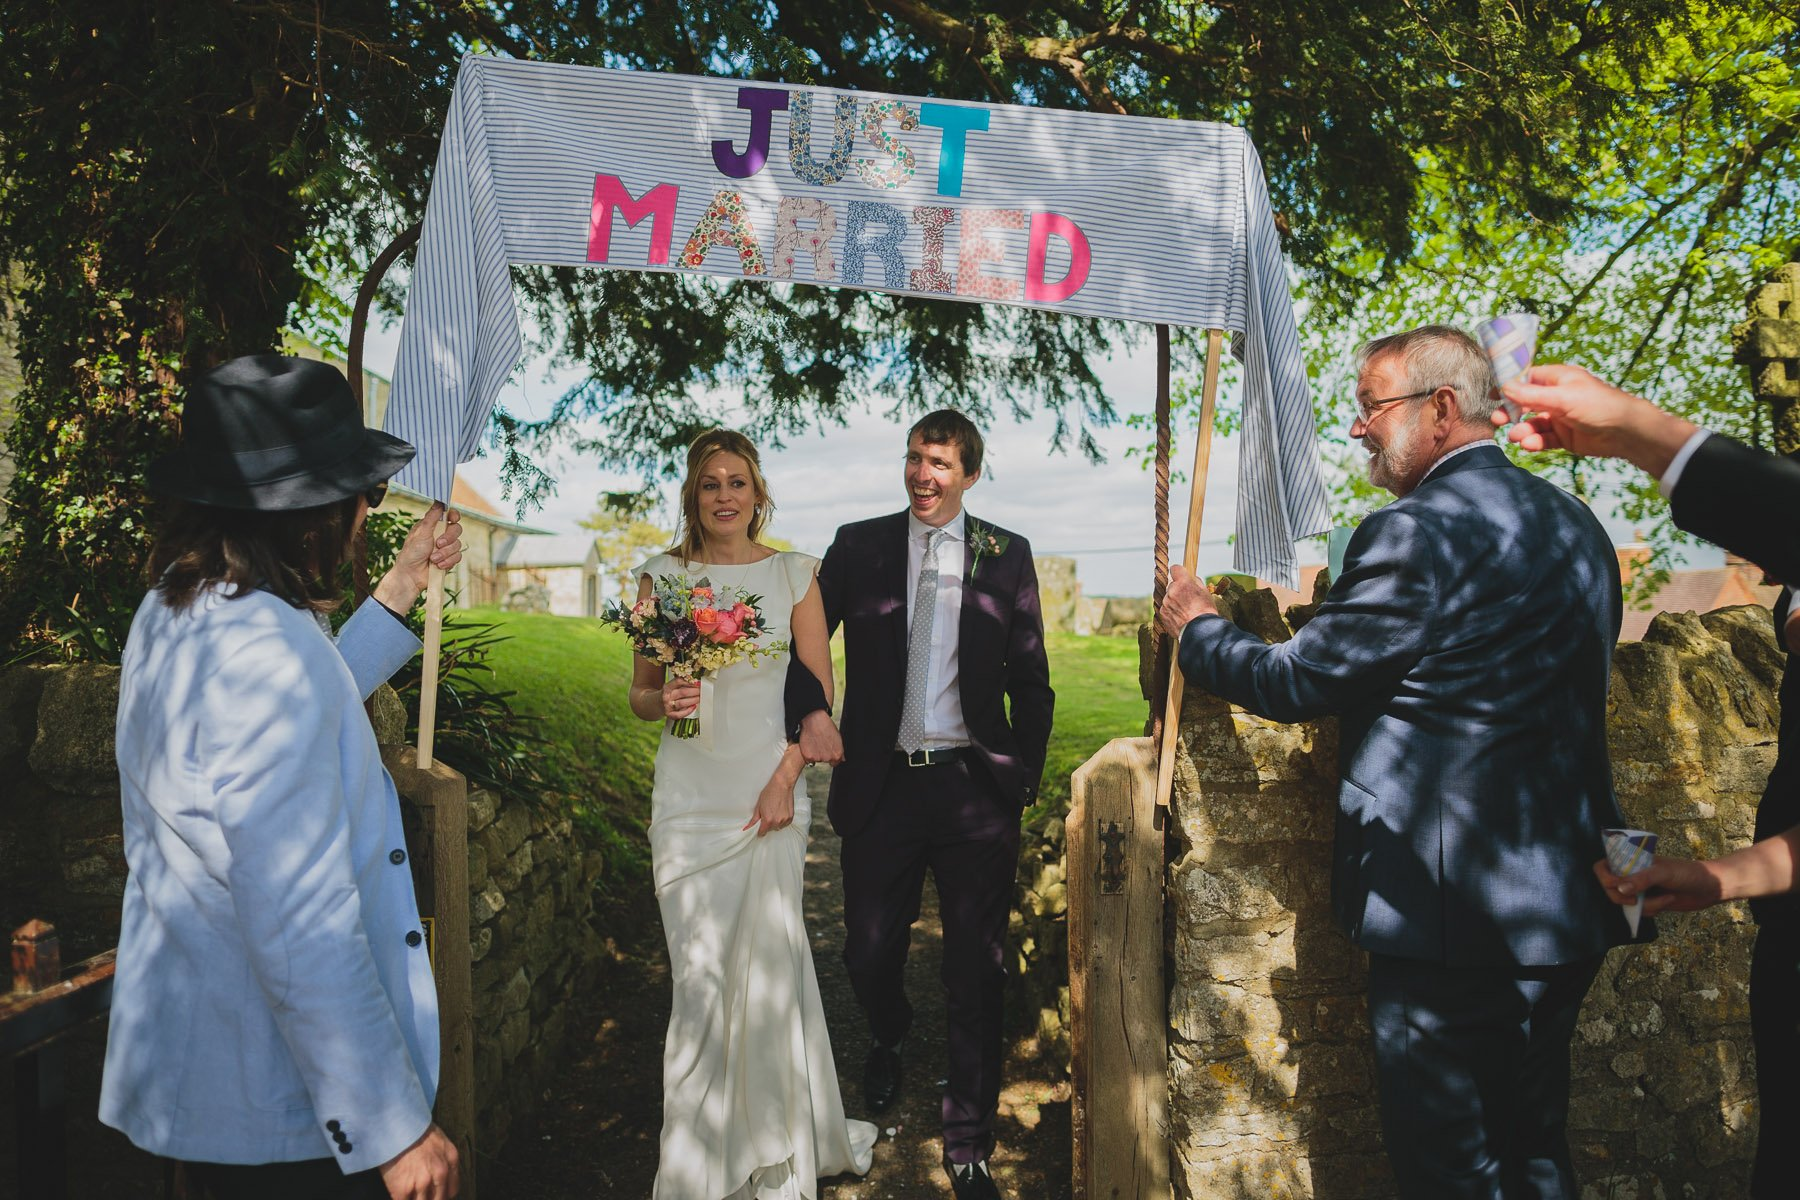 Buckinghamshire-Wedding-Lizzie-Duncan-083